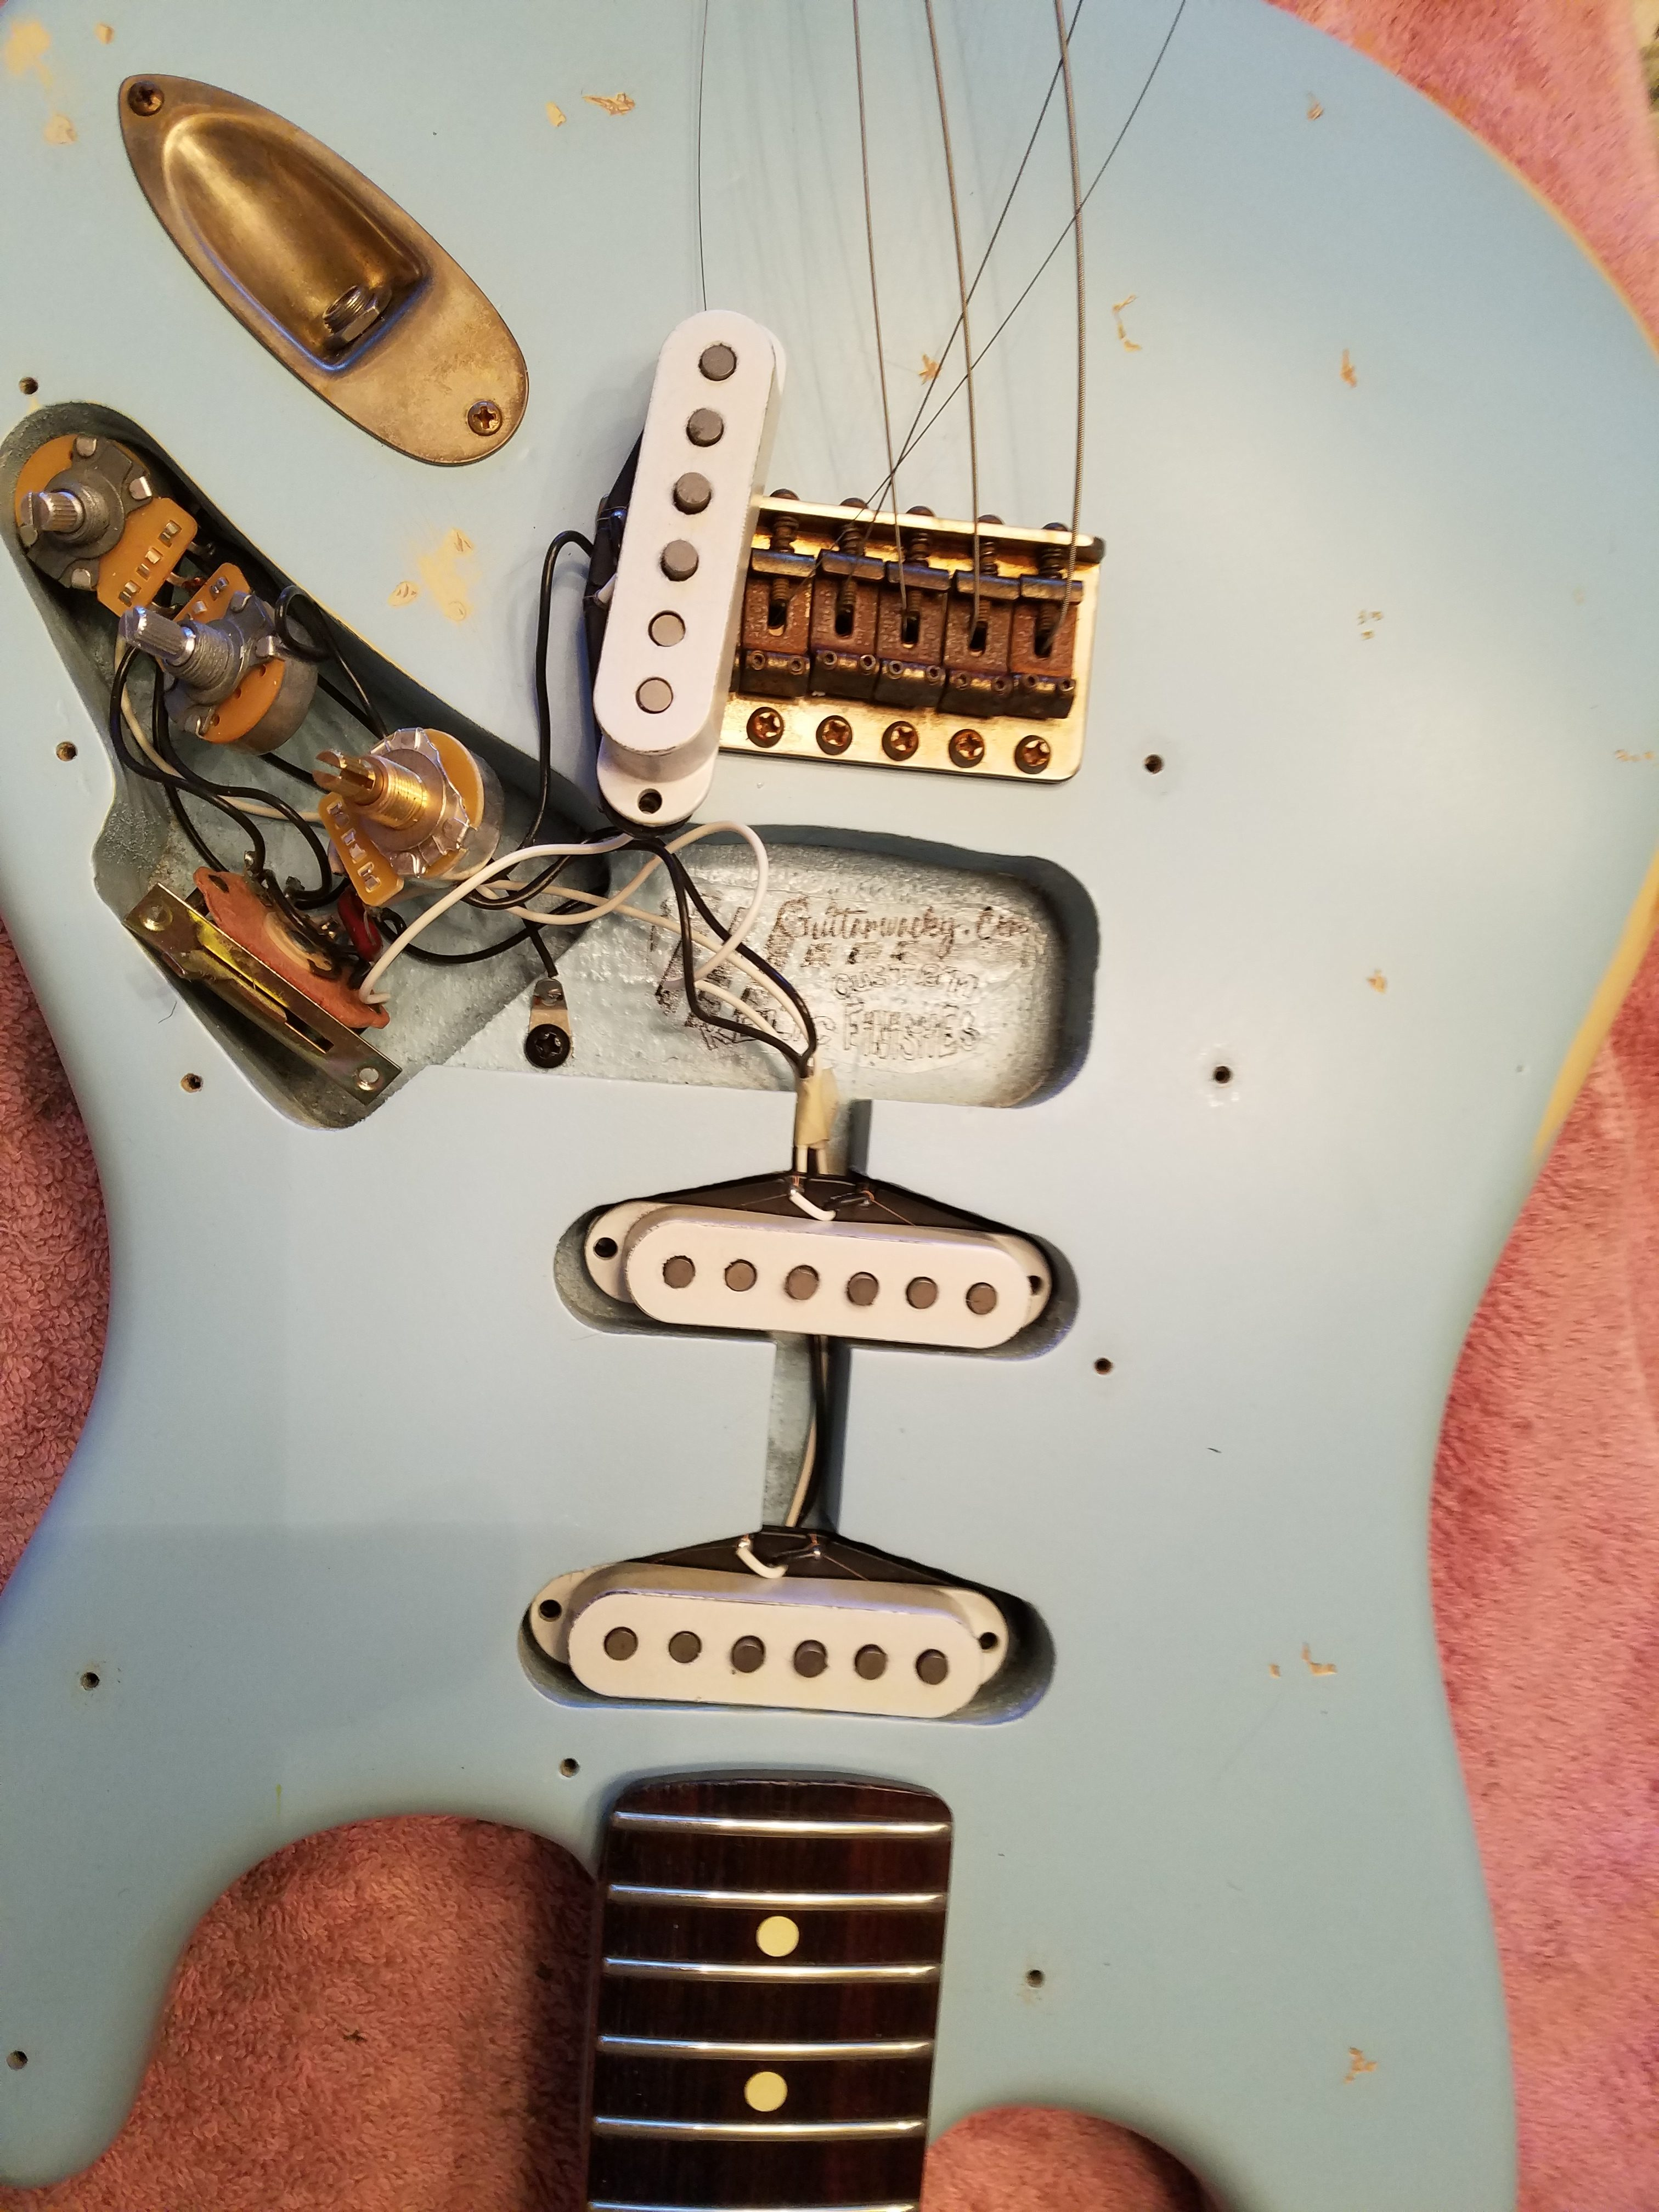 Fender Stratocaster Relic Daphne Blue Electronics Rosewood Neck Frets Pickguard Guitarwacky.com